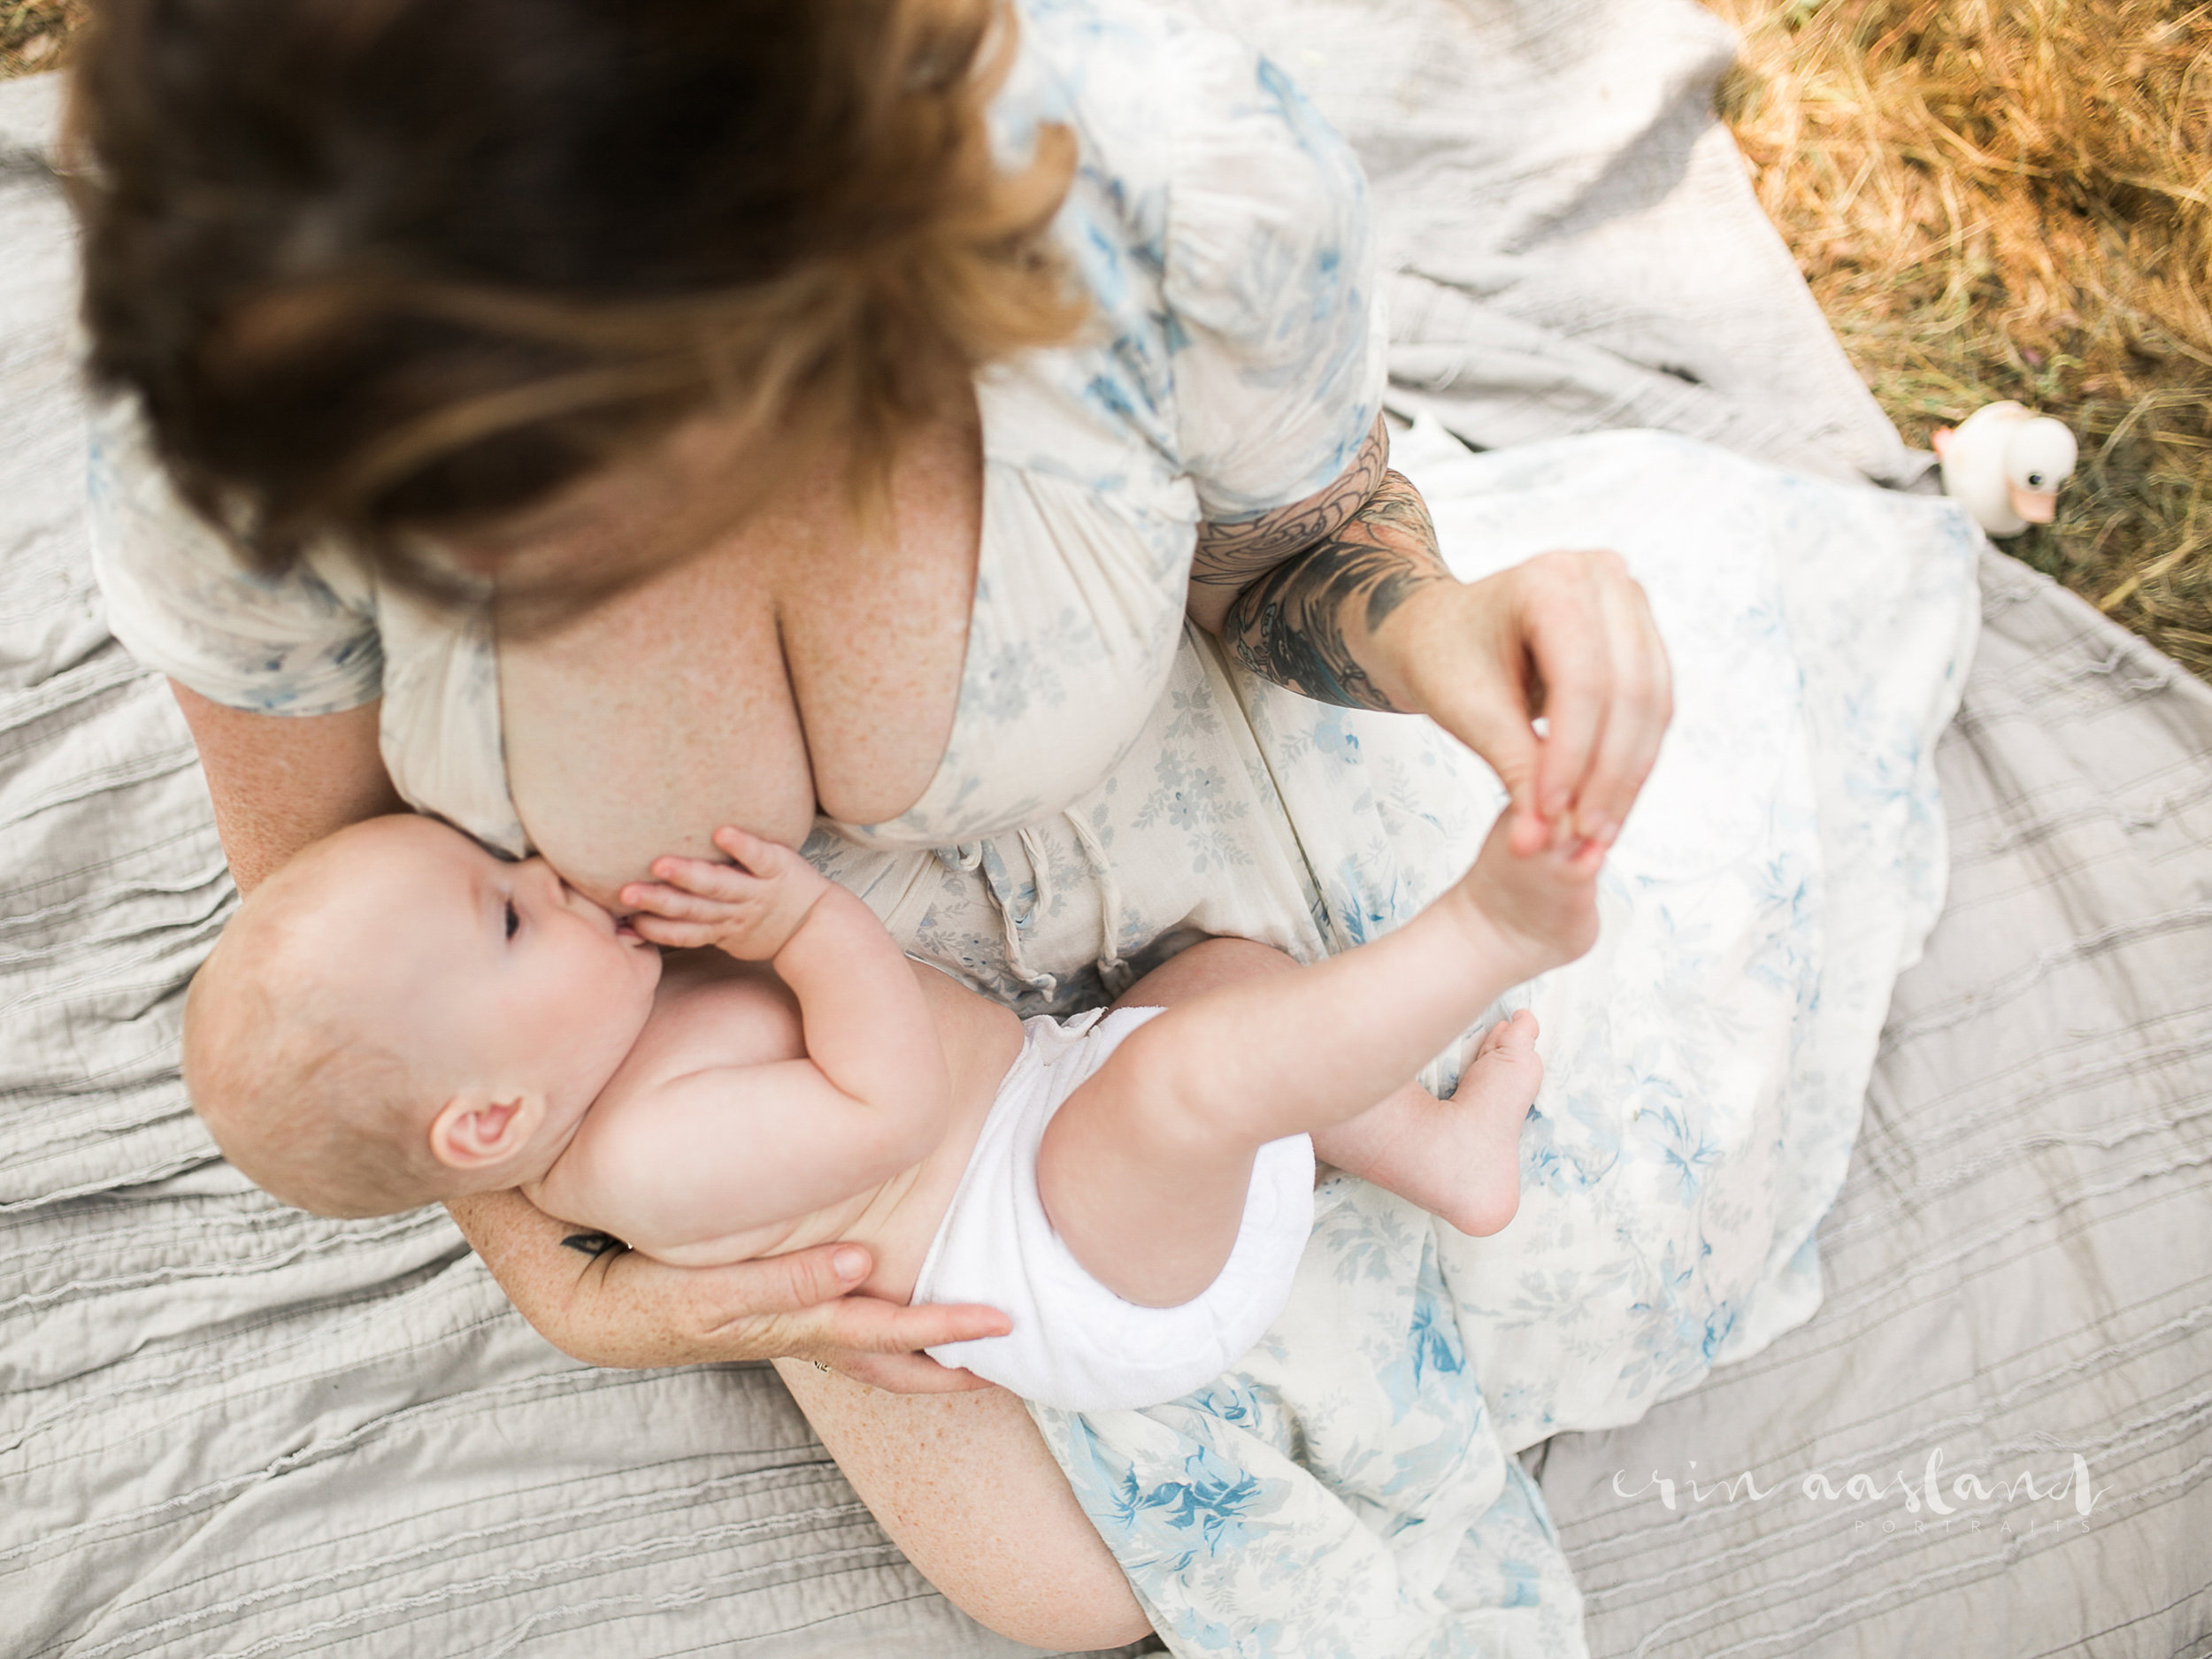 Erin Aasland Snoqualmie Family Photographer 6 mo baby breastfeeding over shot moment